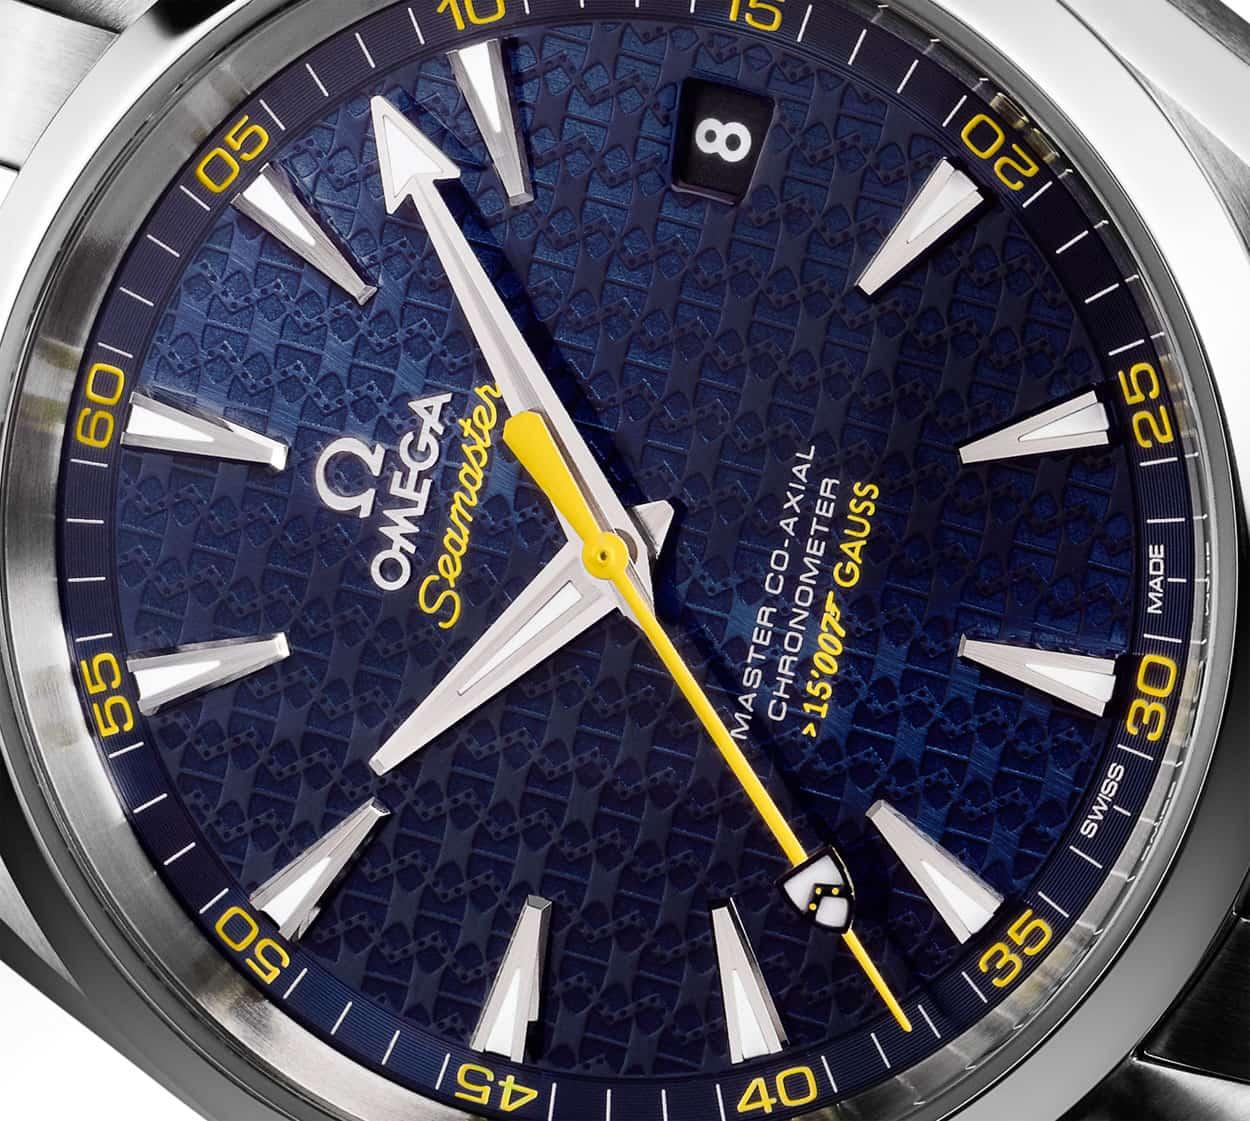 Omega Seamaster Aqua Terra James Bond Spectre Edition